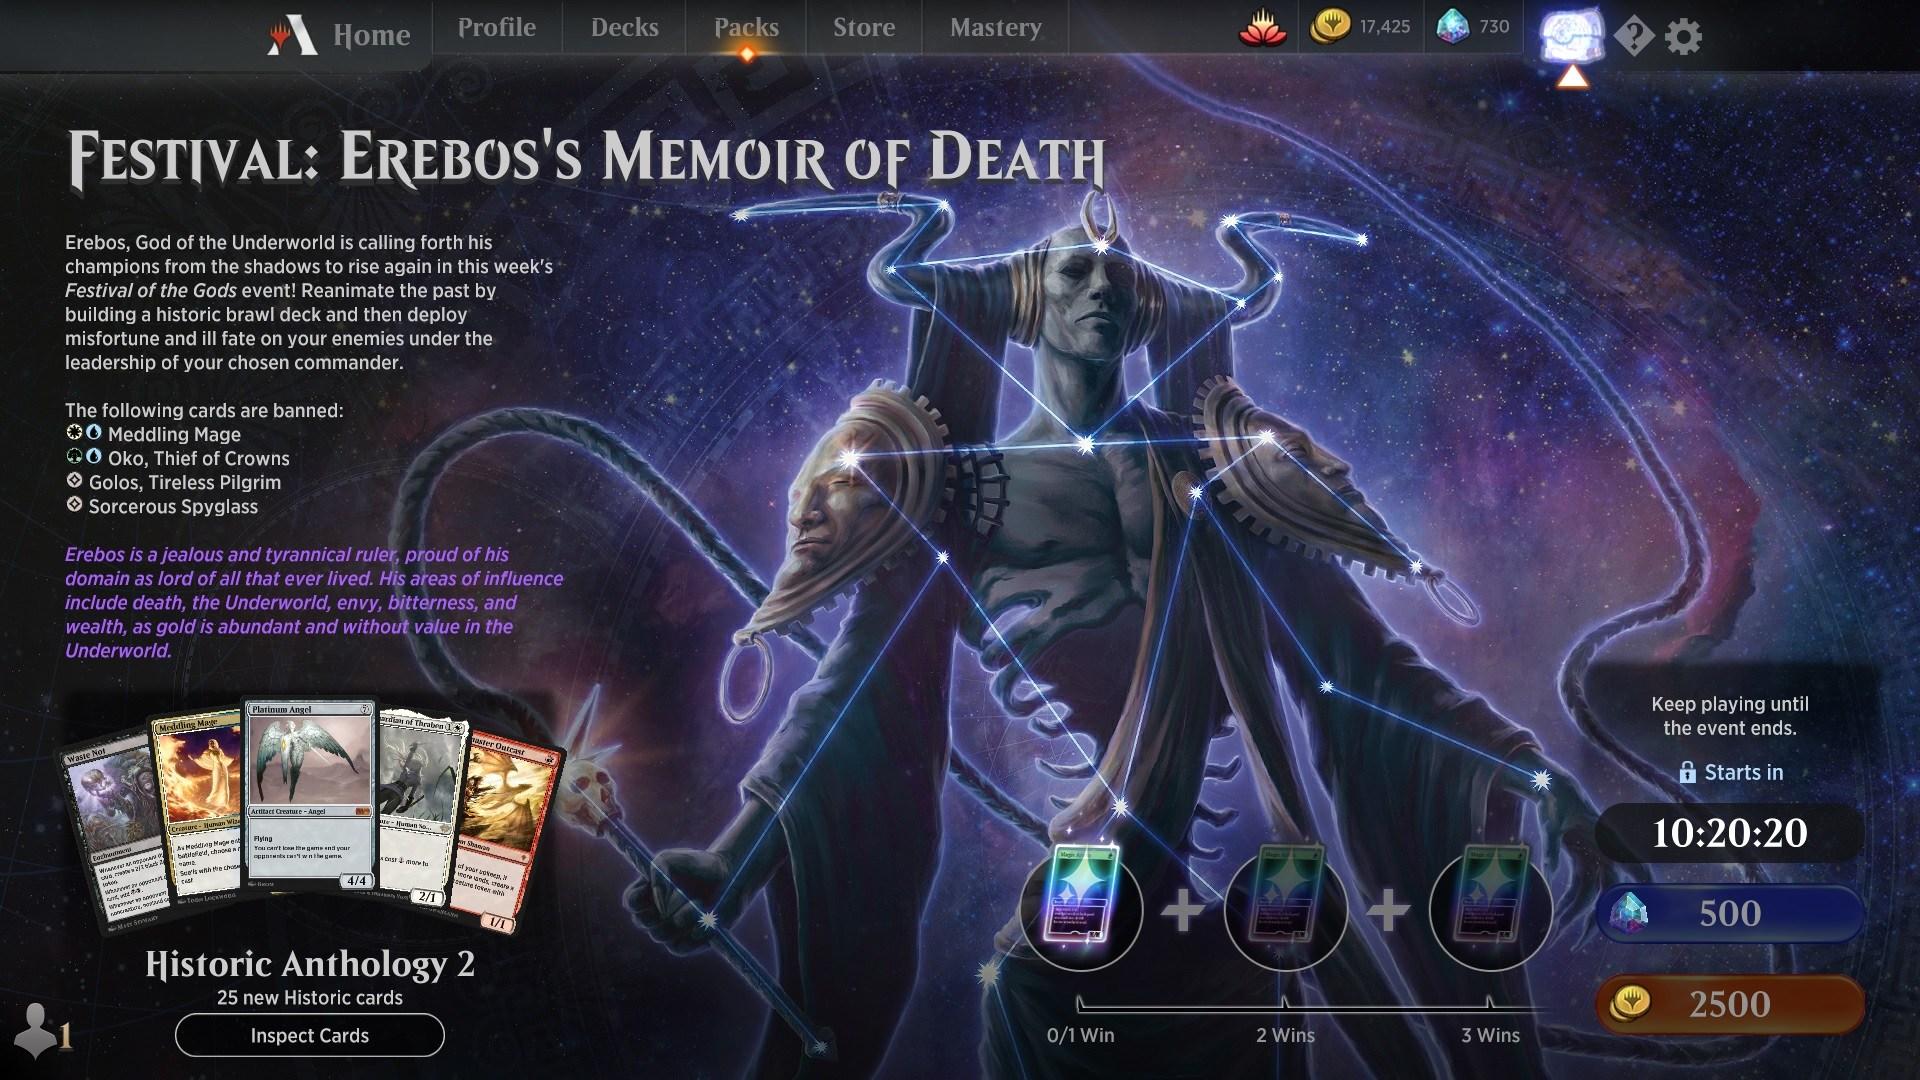 MTG Arena Festival Erebos's Memoir of Death event